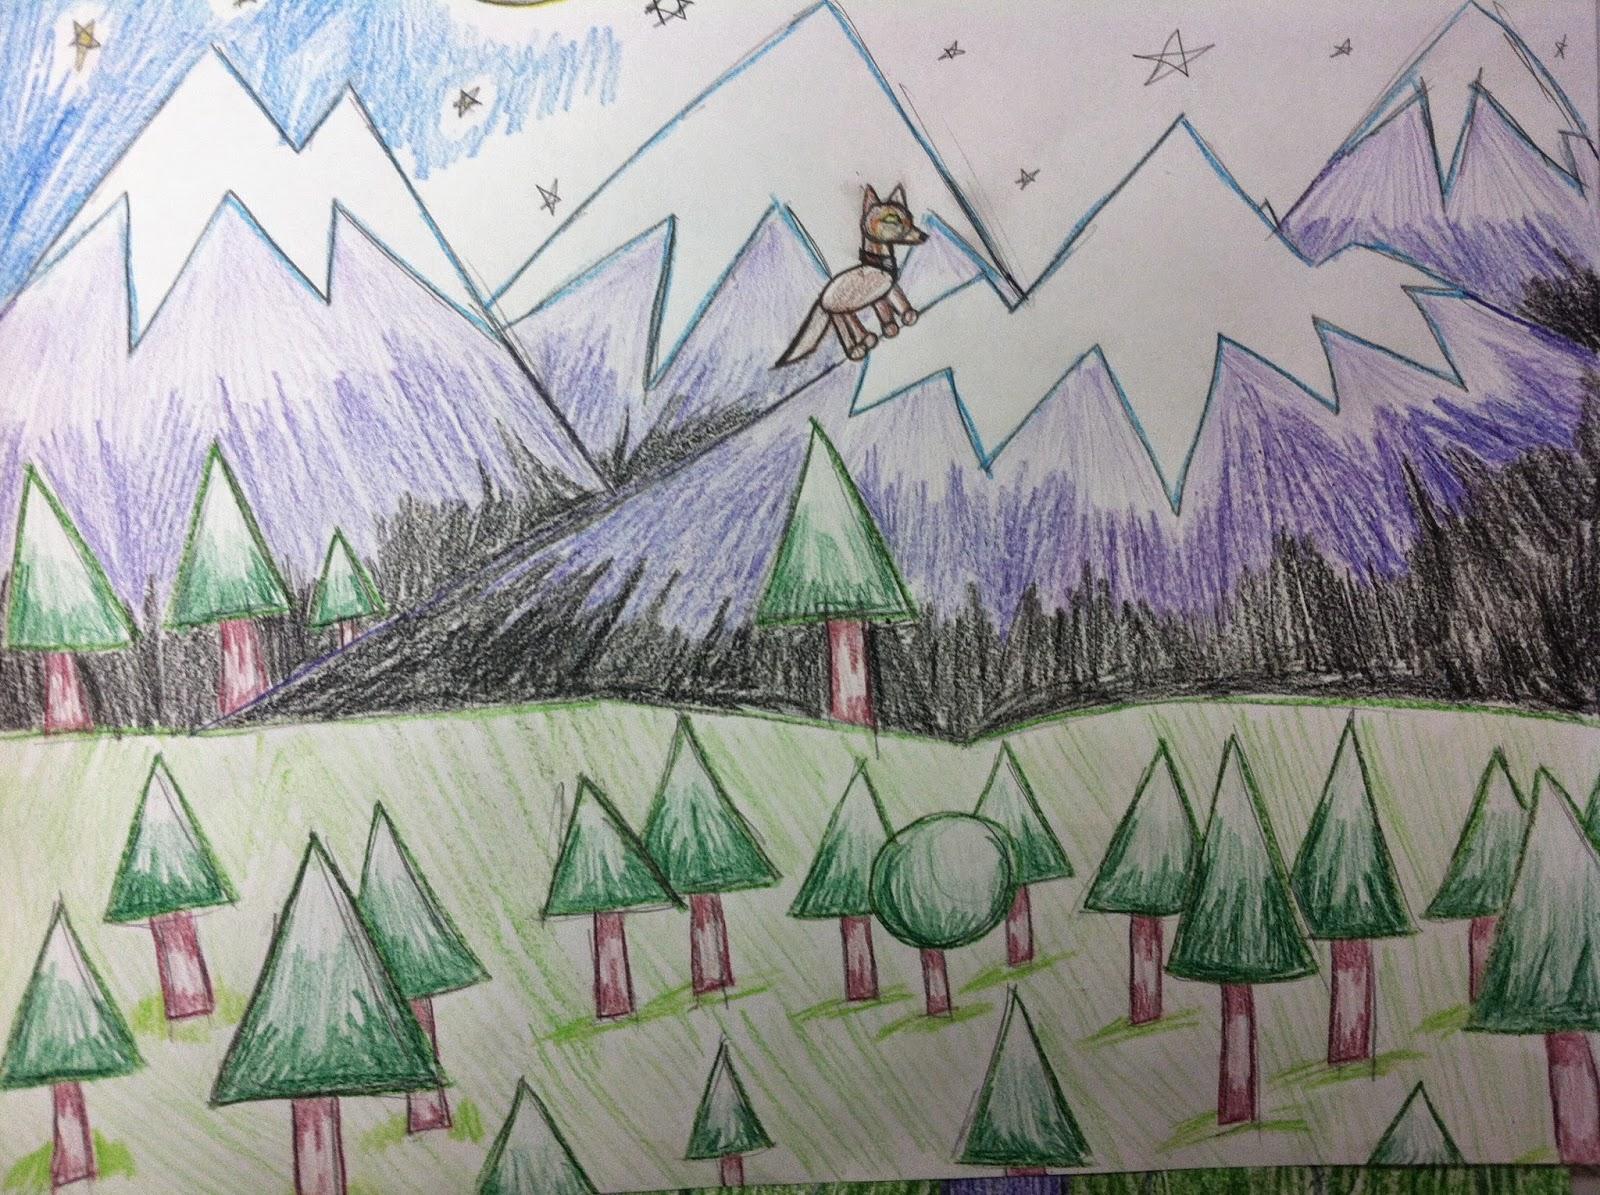 Drawn scenic geometrical shape Shapes Landscape Mrs using only